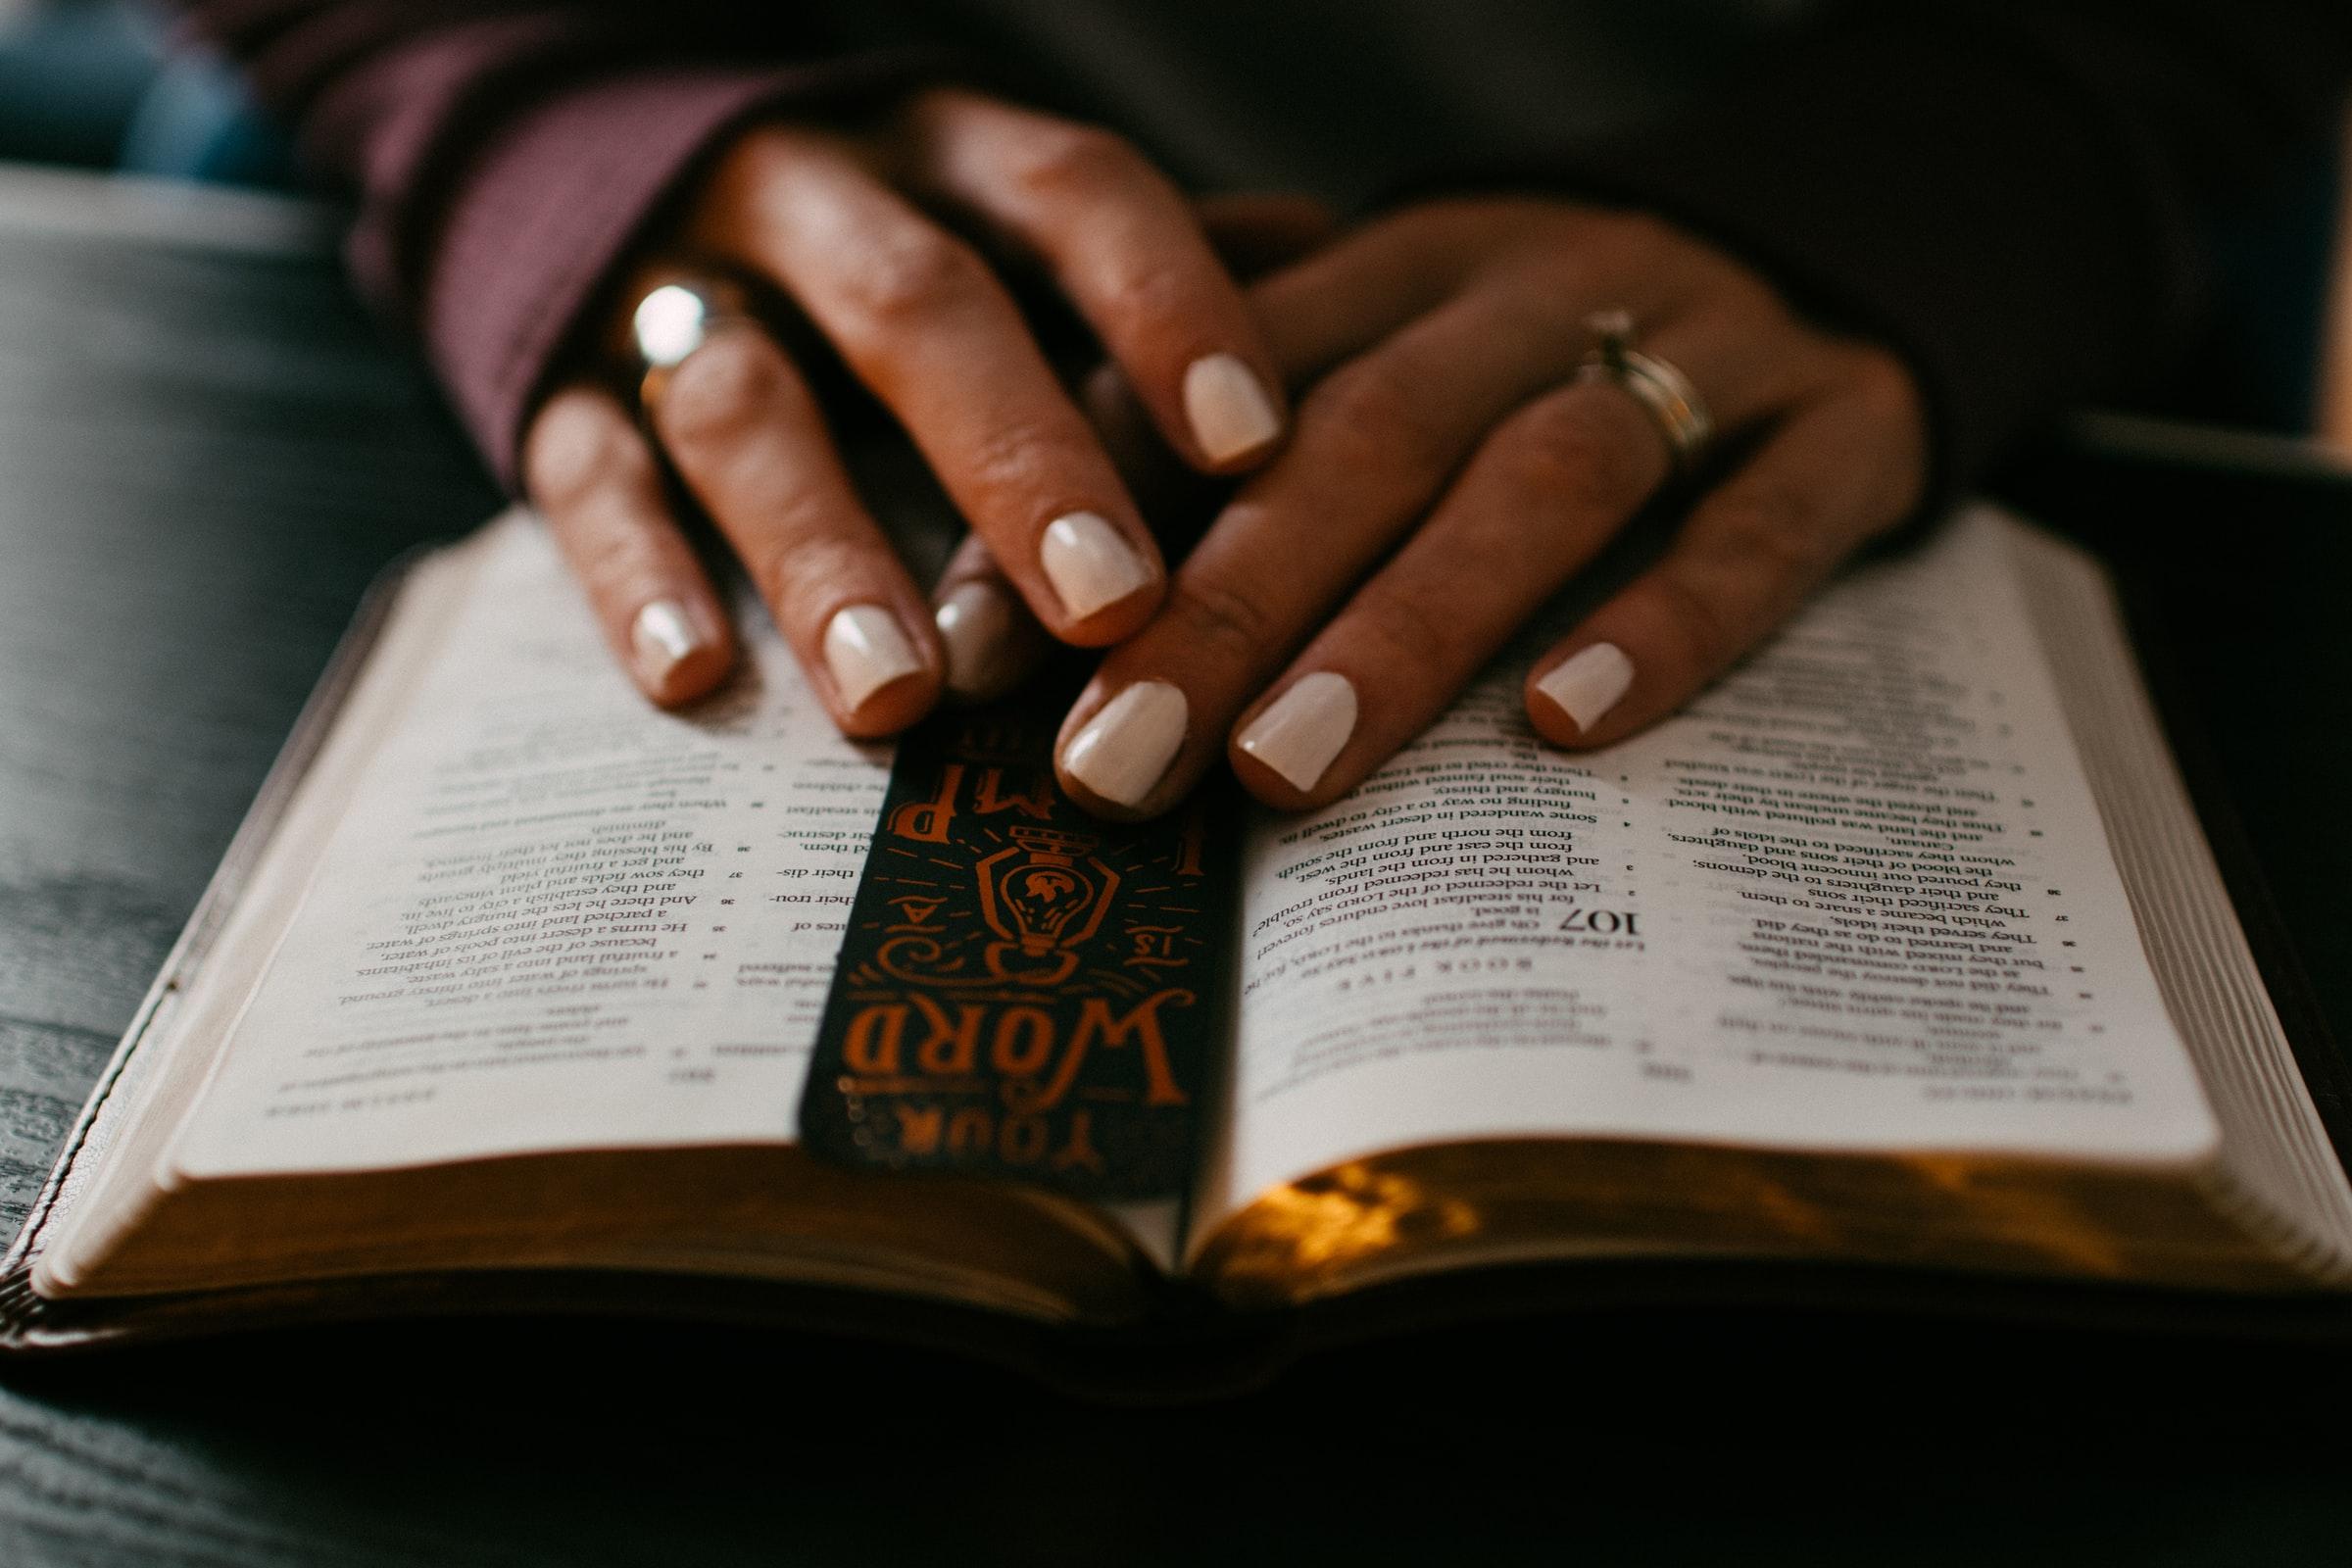 prayer with bible